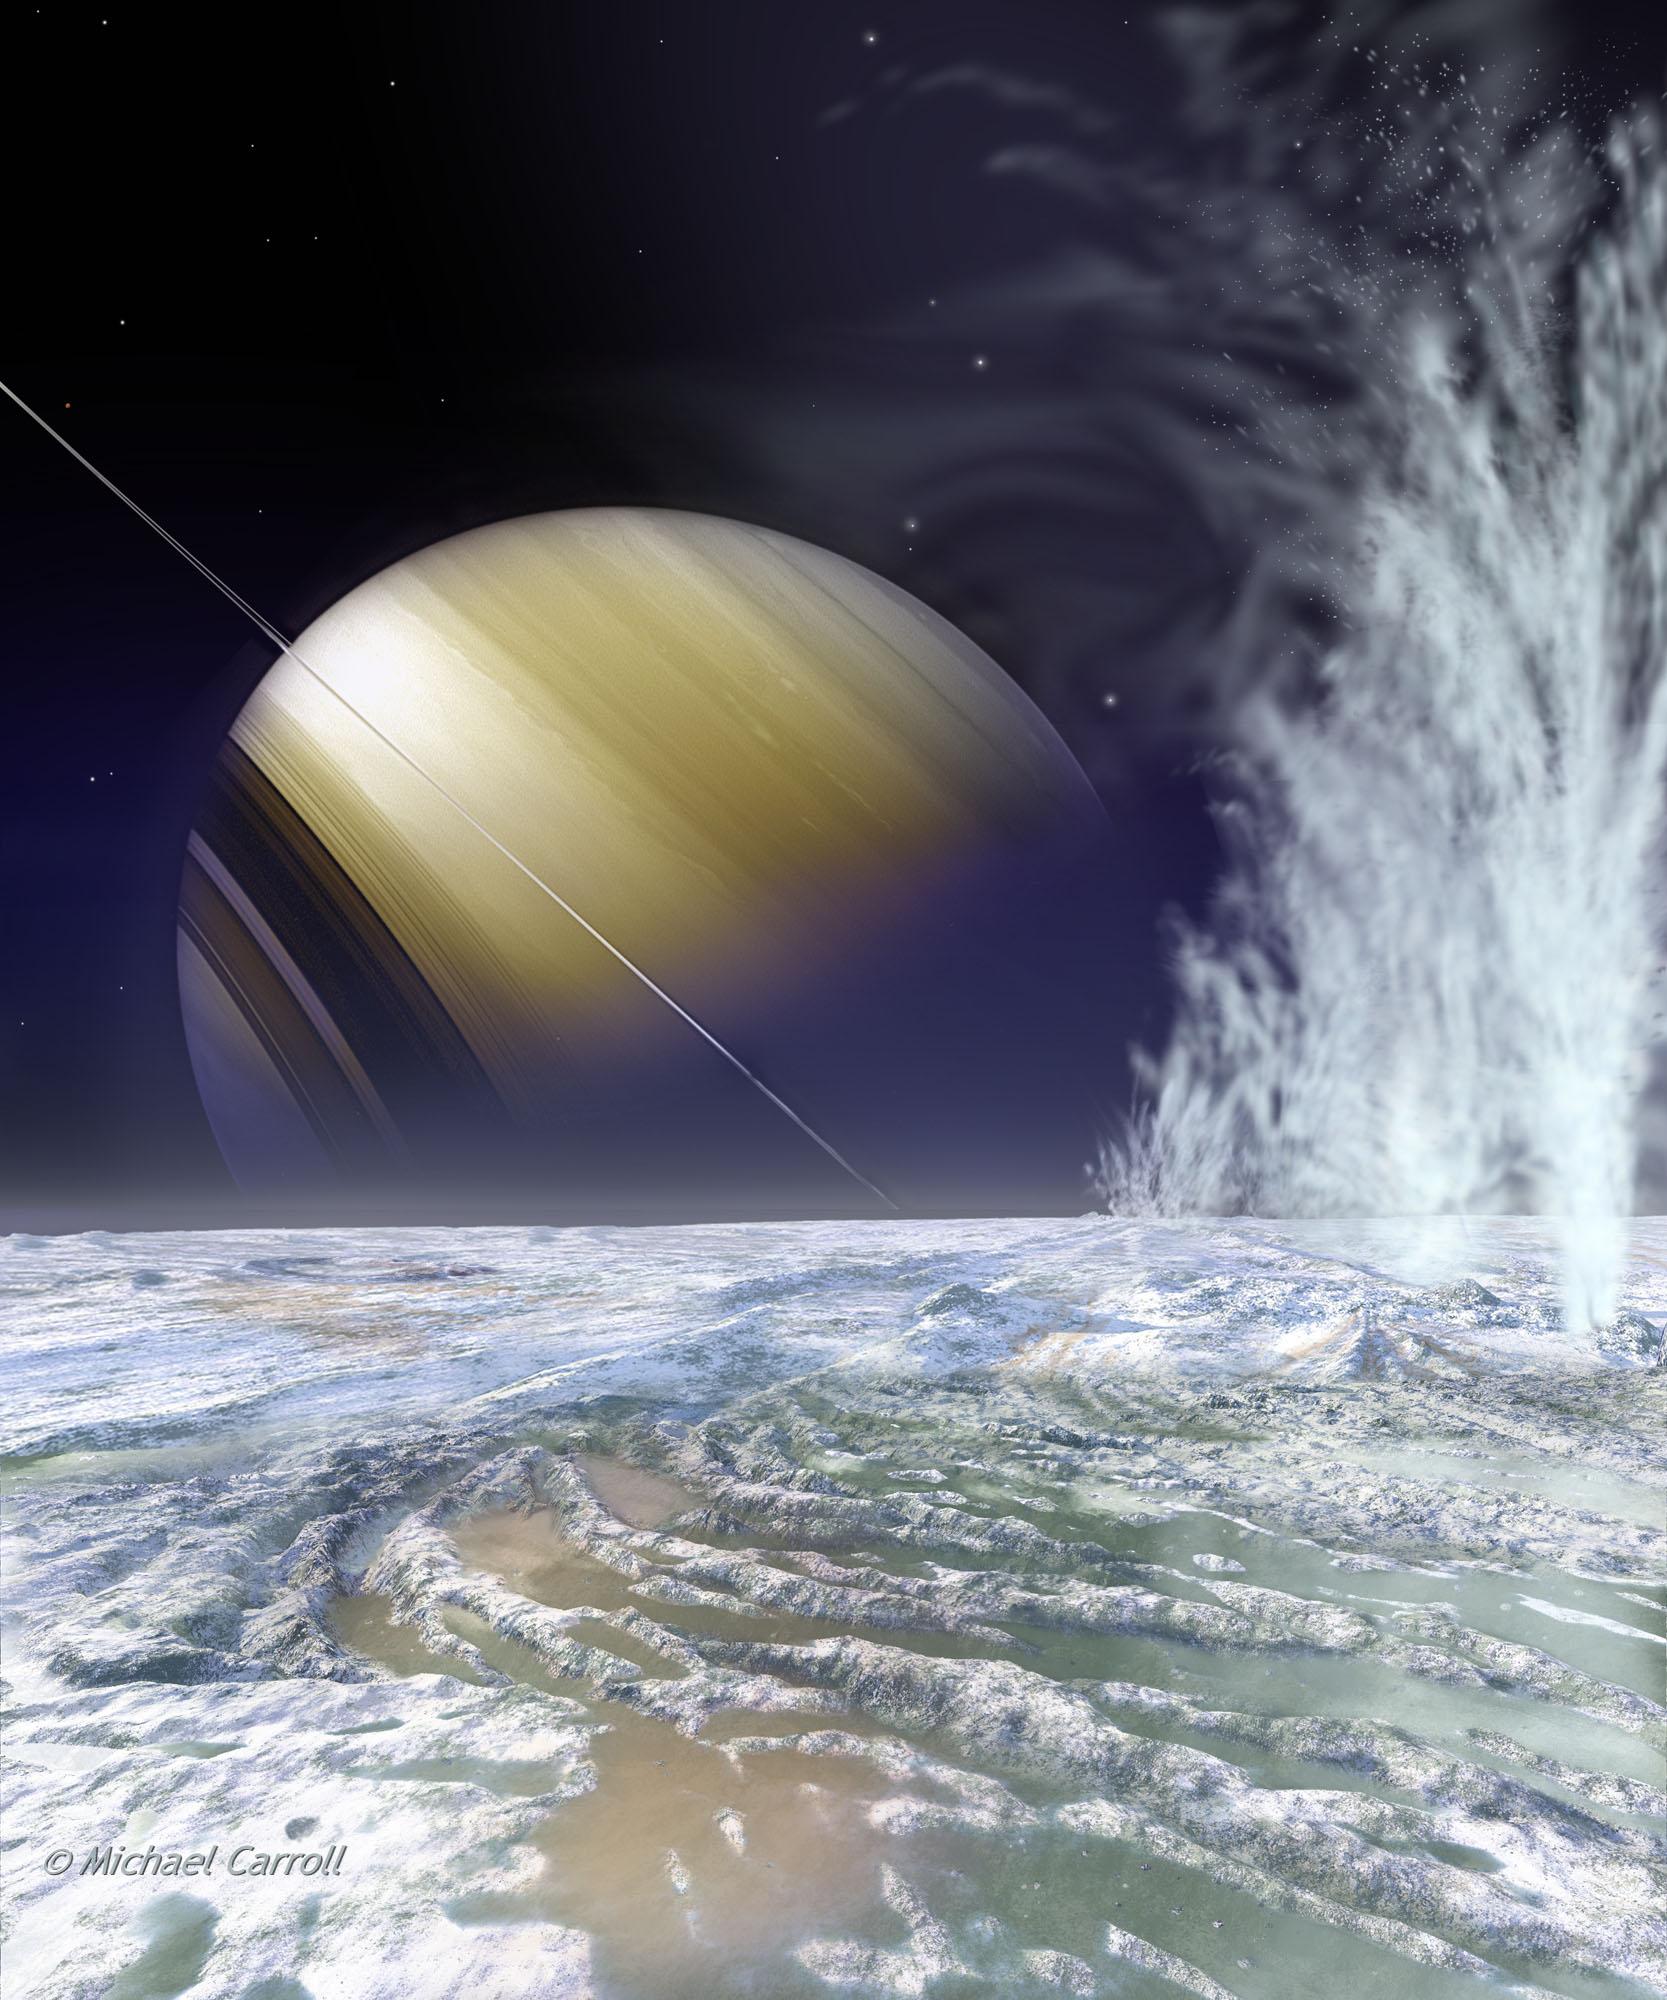 http://eternosaprendizes.com/wp-content/uploads/2008/10/enceladus-por-michael-carroll.jpg